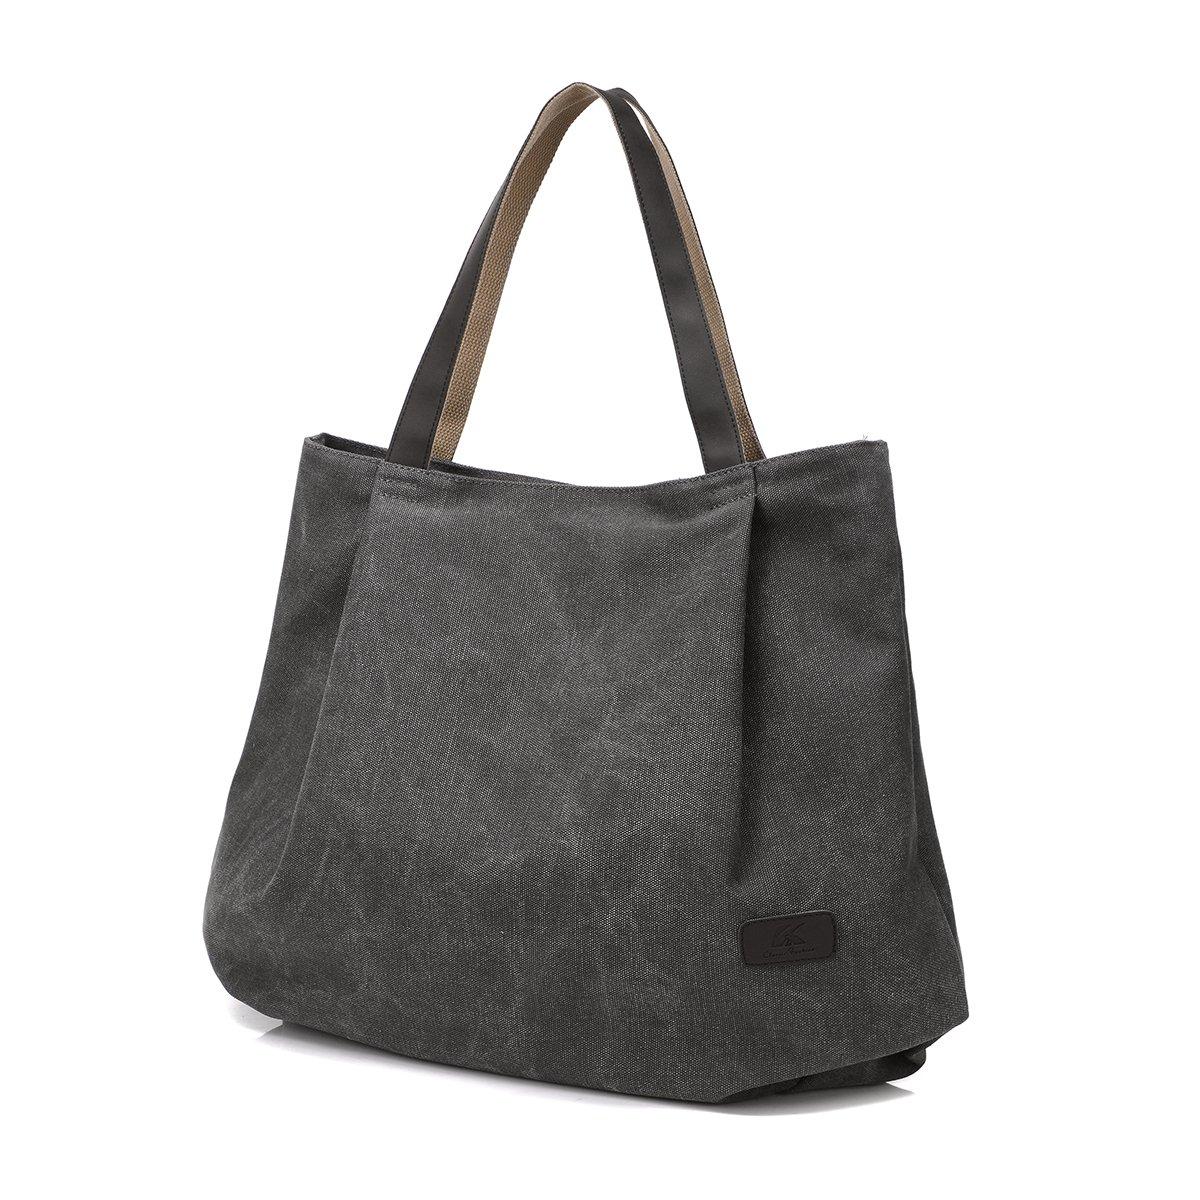 Qflmy Retro Hobo Style Qflmy Women's Canvas Casual Handbag Shoulder Bag Messenger Bag (Gray)